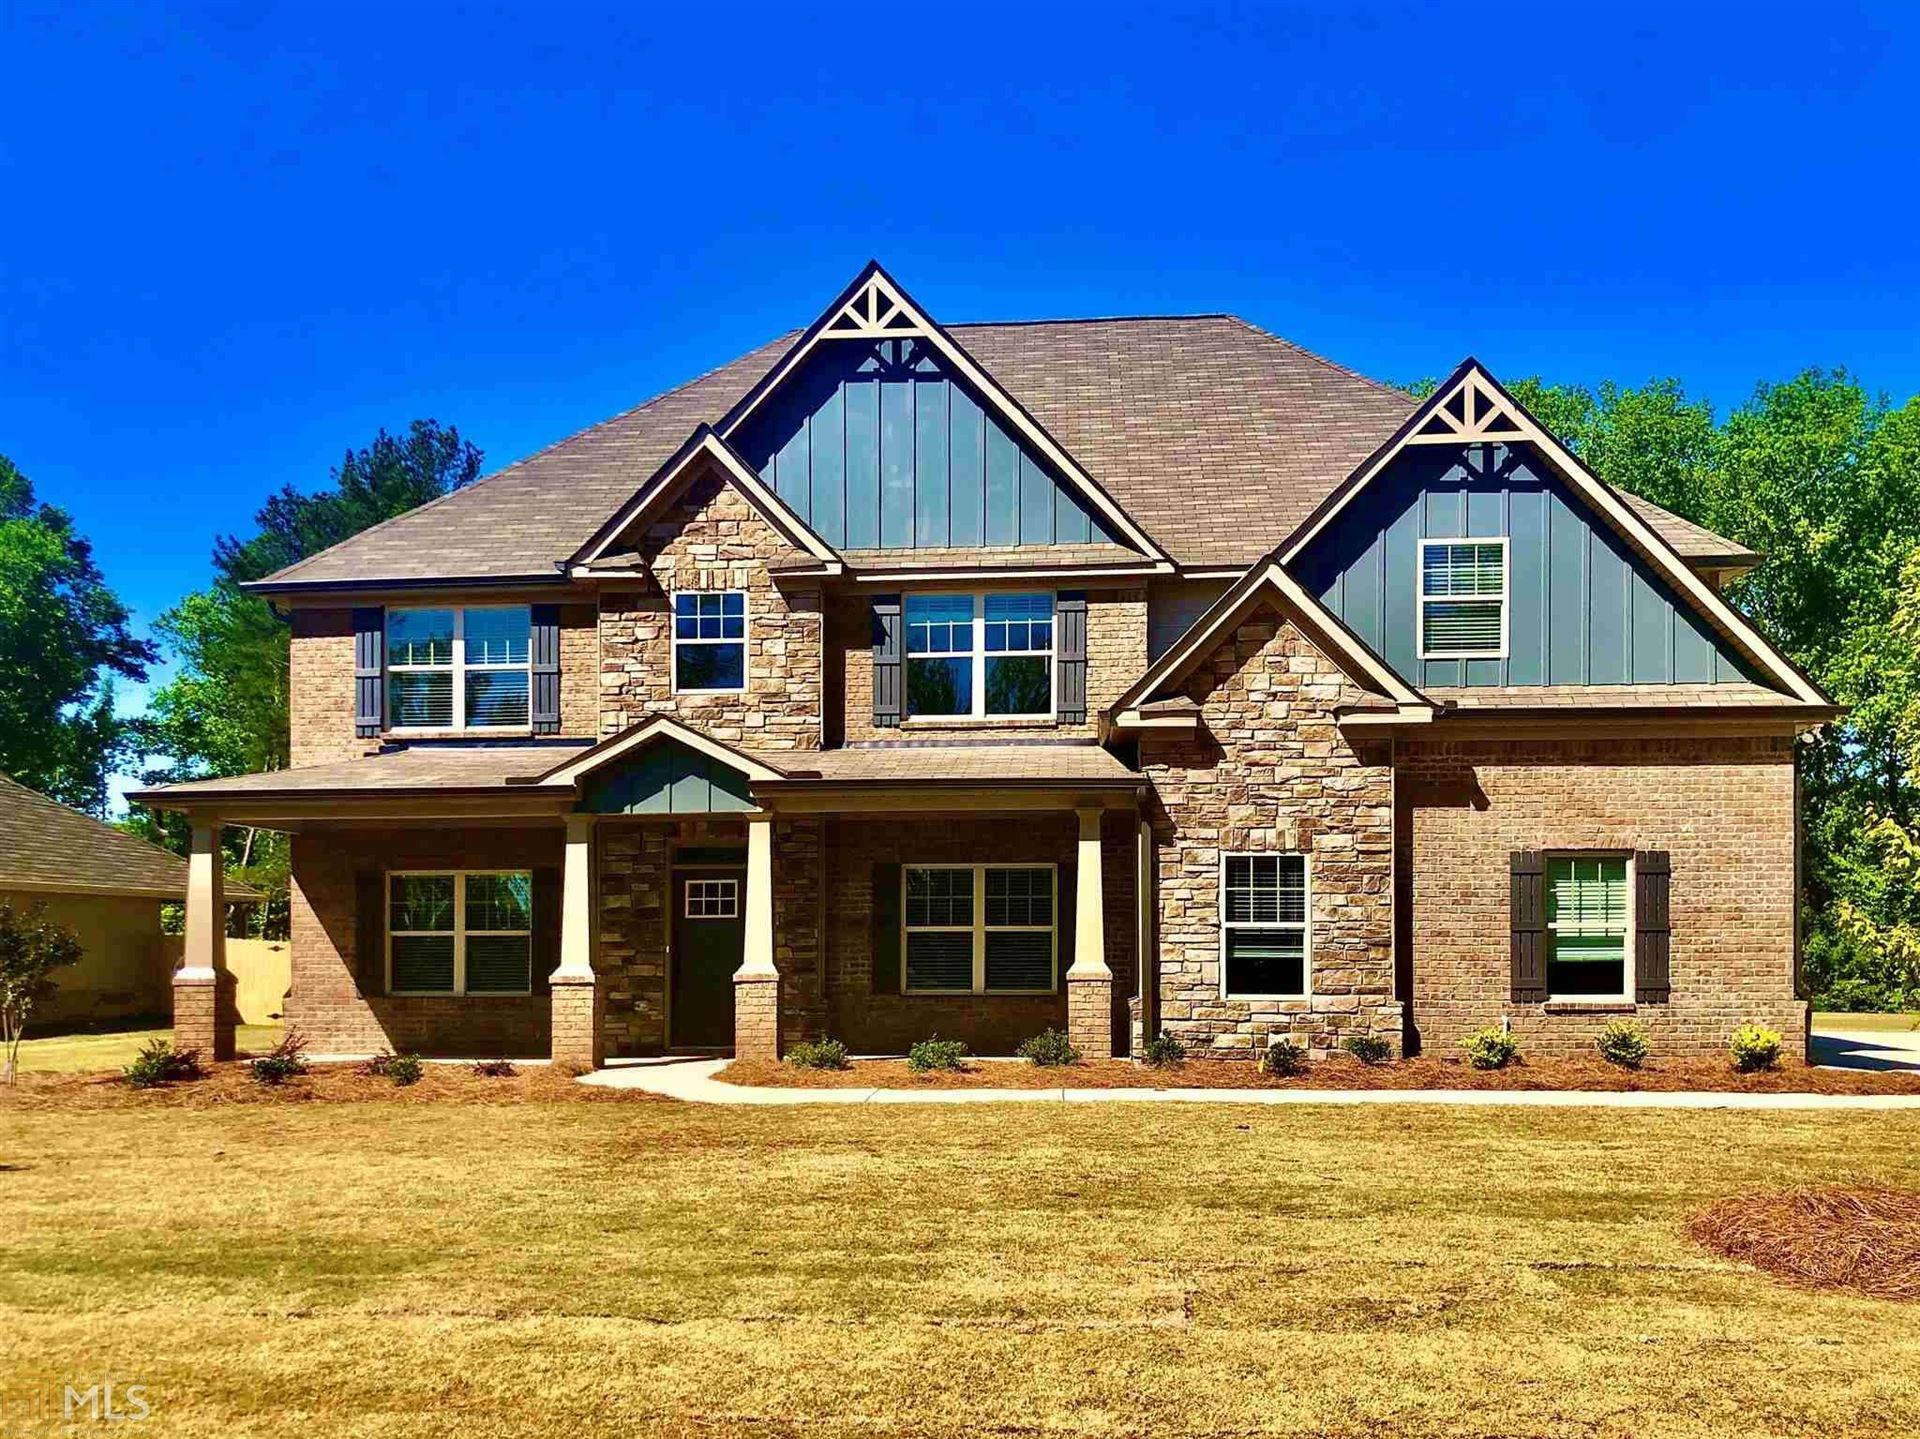 412 Guildhouse Drive Lot 38, McDonough, GA 30252 - #: 8844806